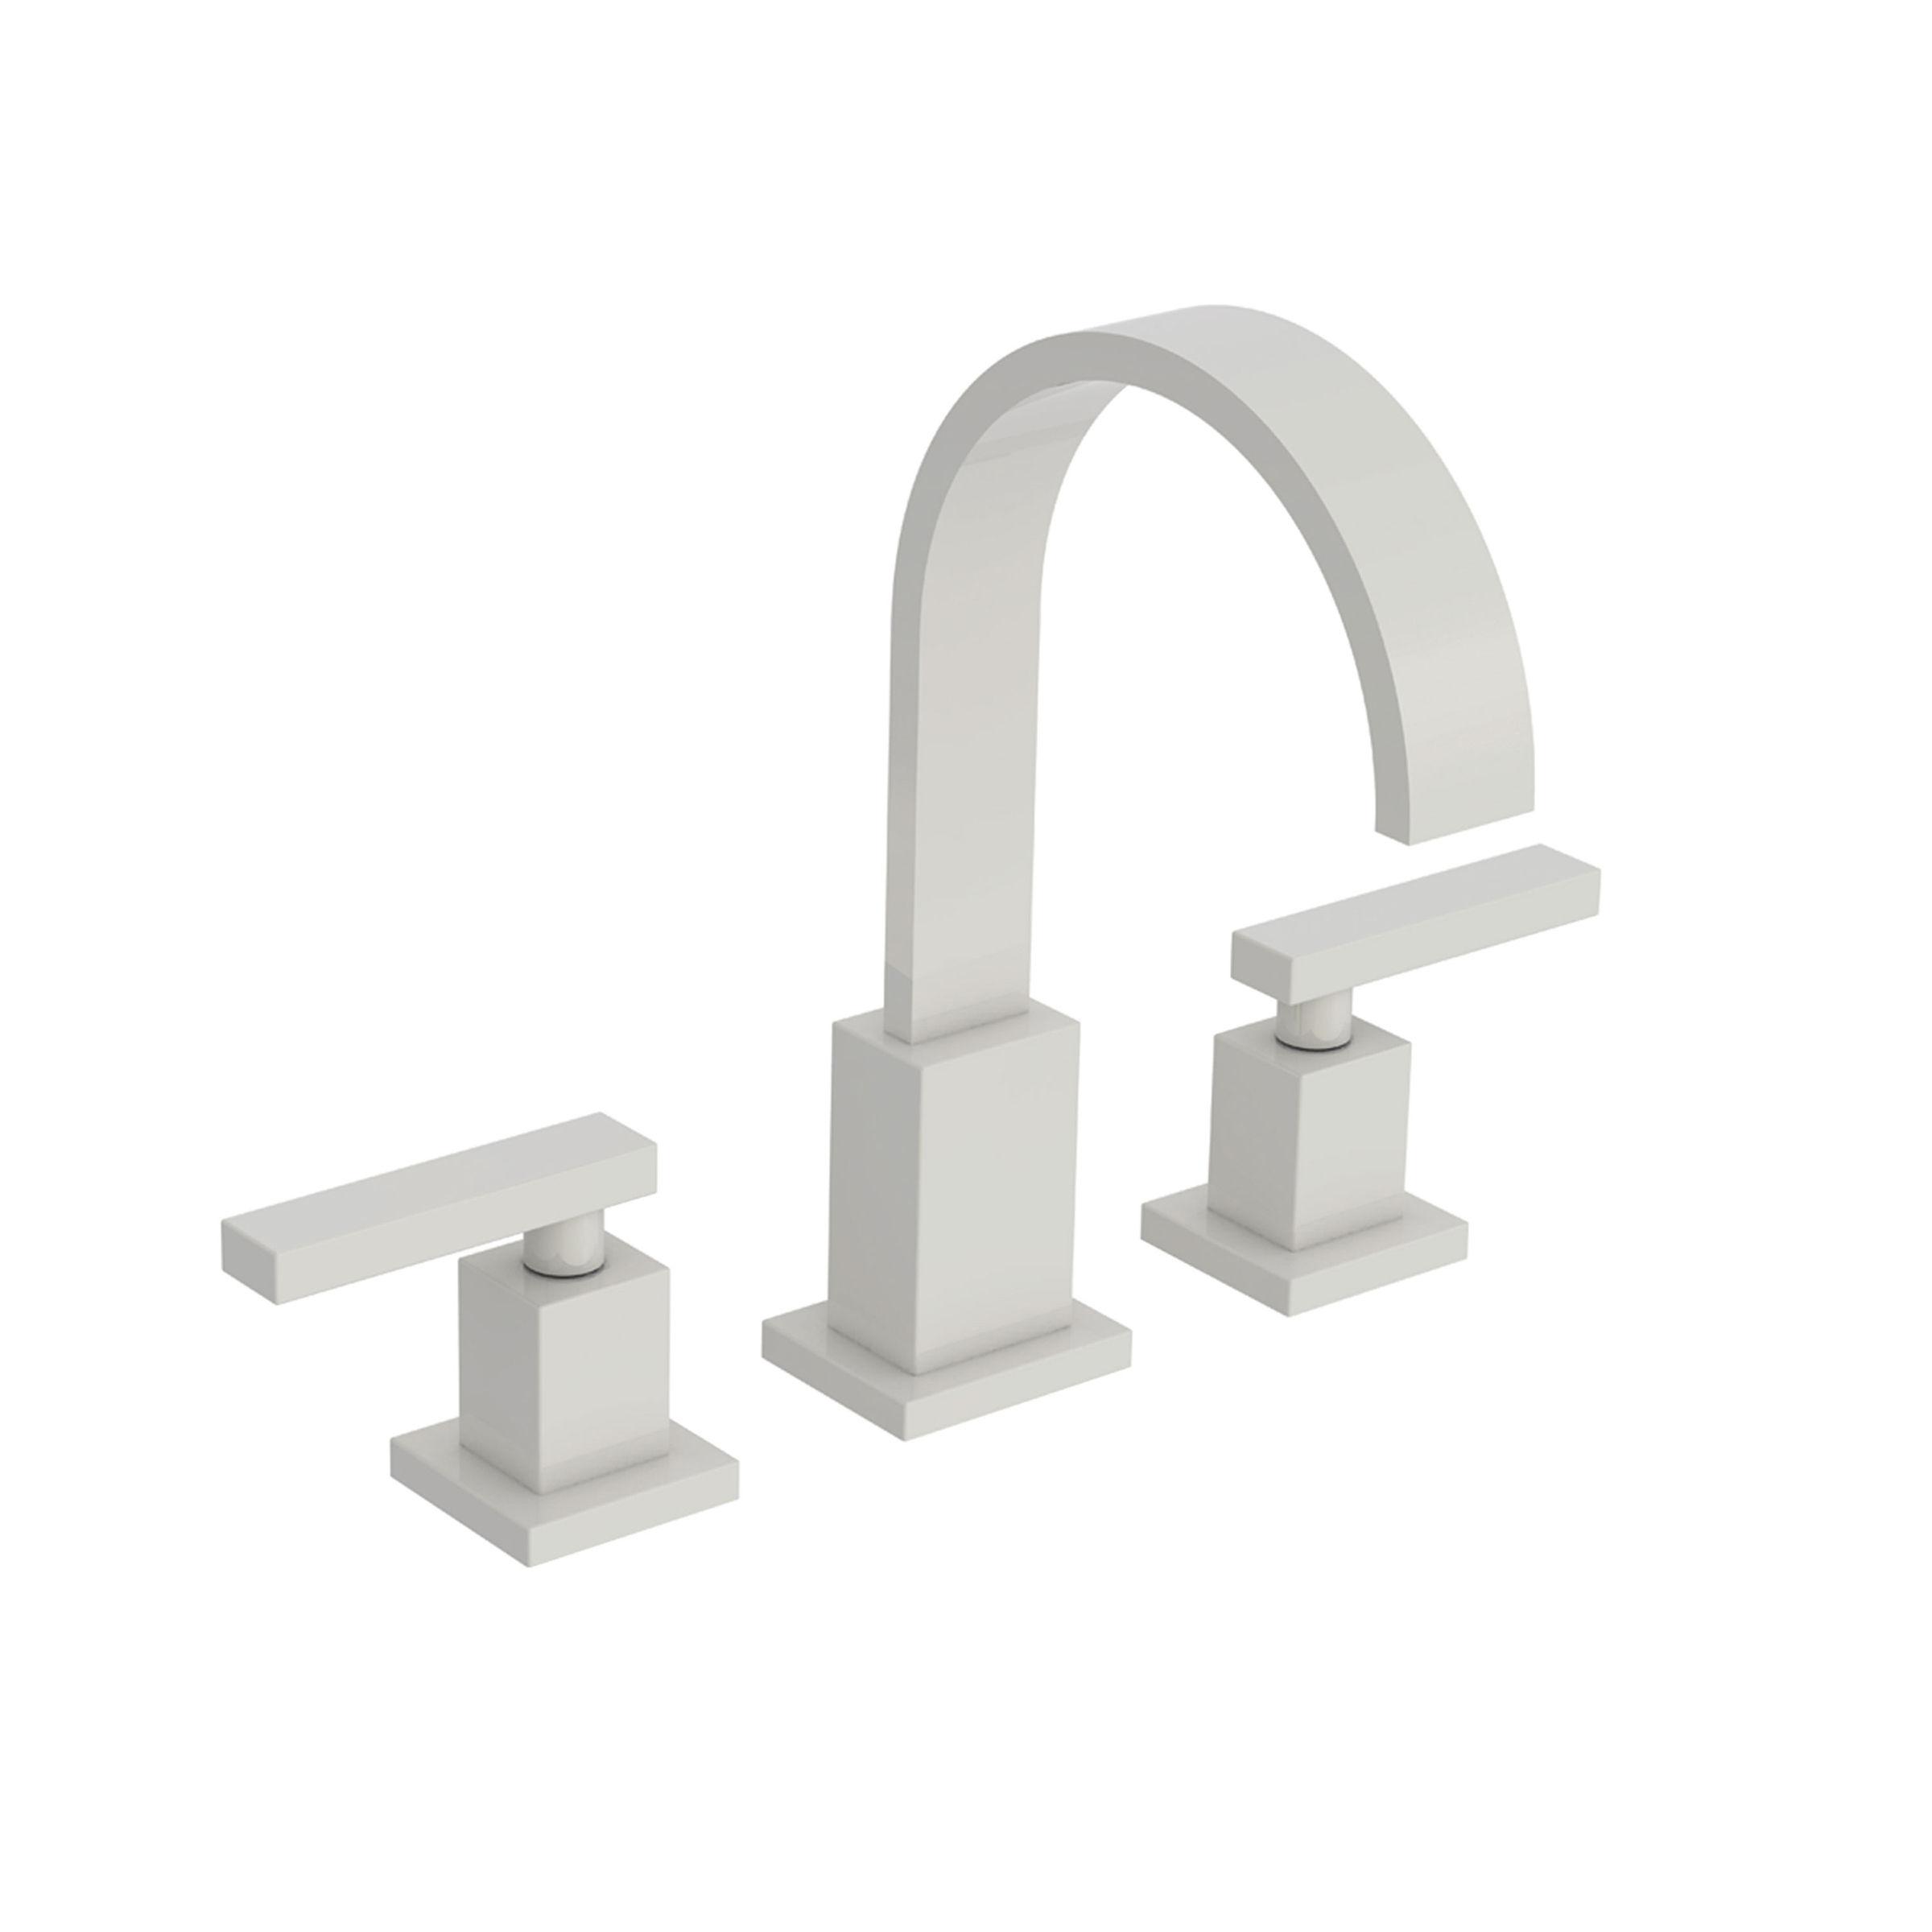 basin kef faucet and bathroom faucets aplos kraus sink handle kraususa single lever com